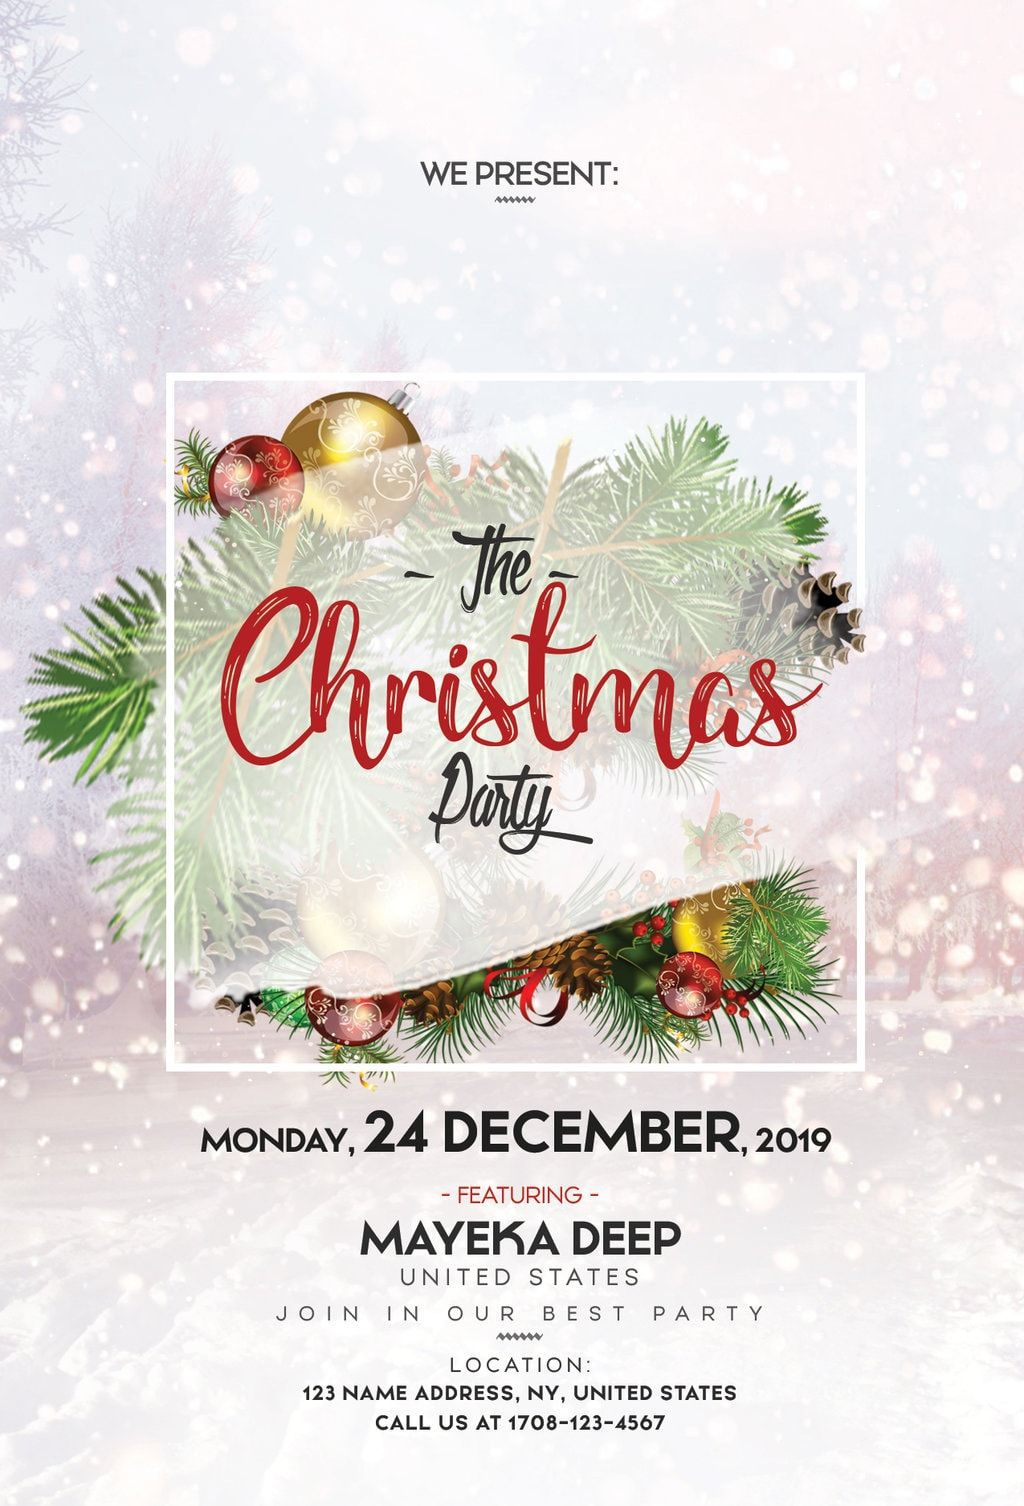 004 Astounding Free Christma Flyer Template Photo  Templates Holiday Invitation Microsoft Word PsdFull